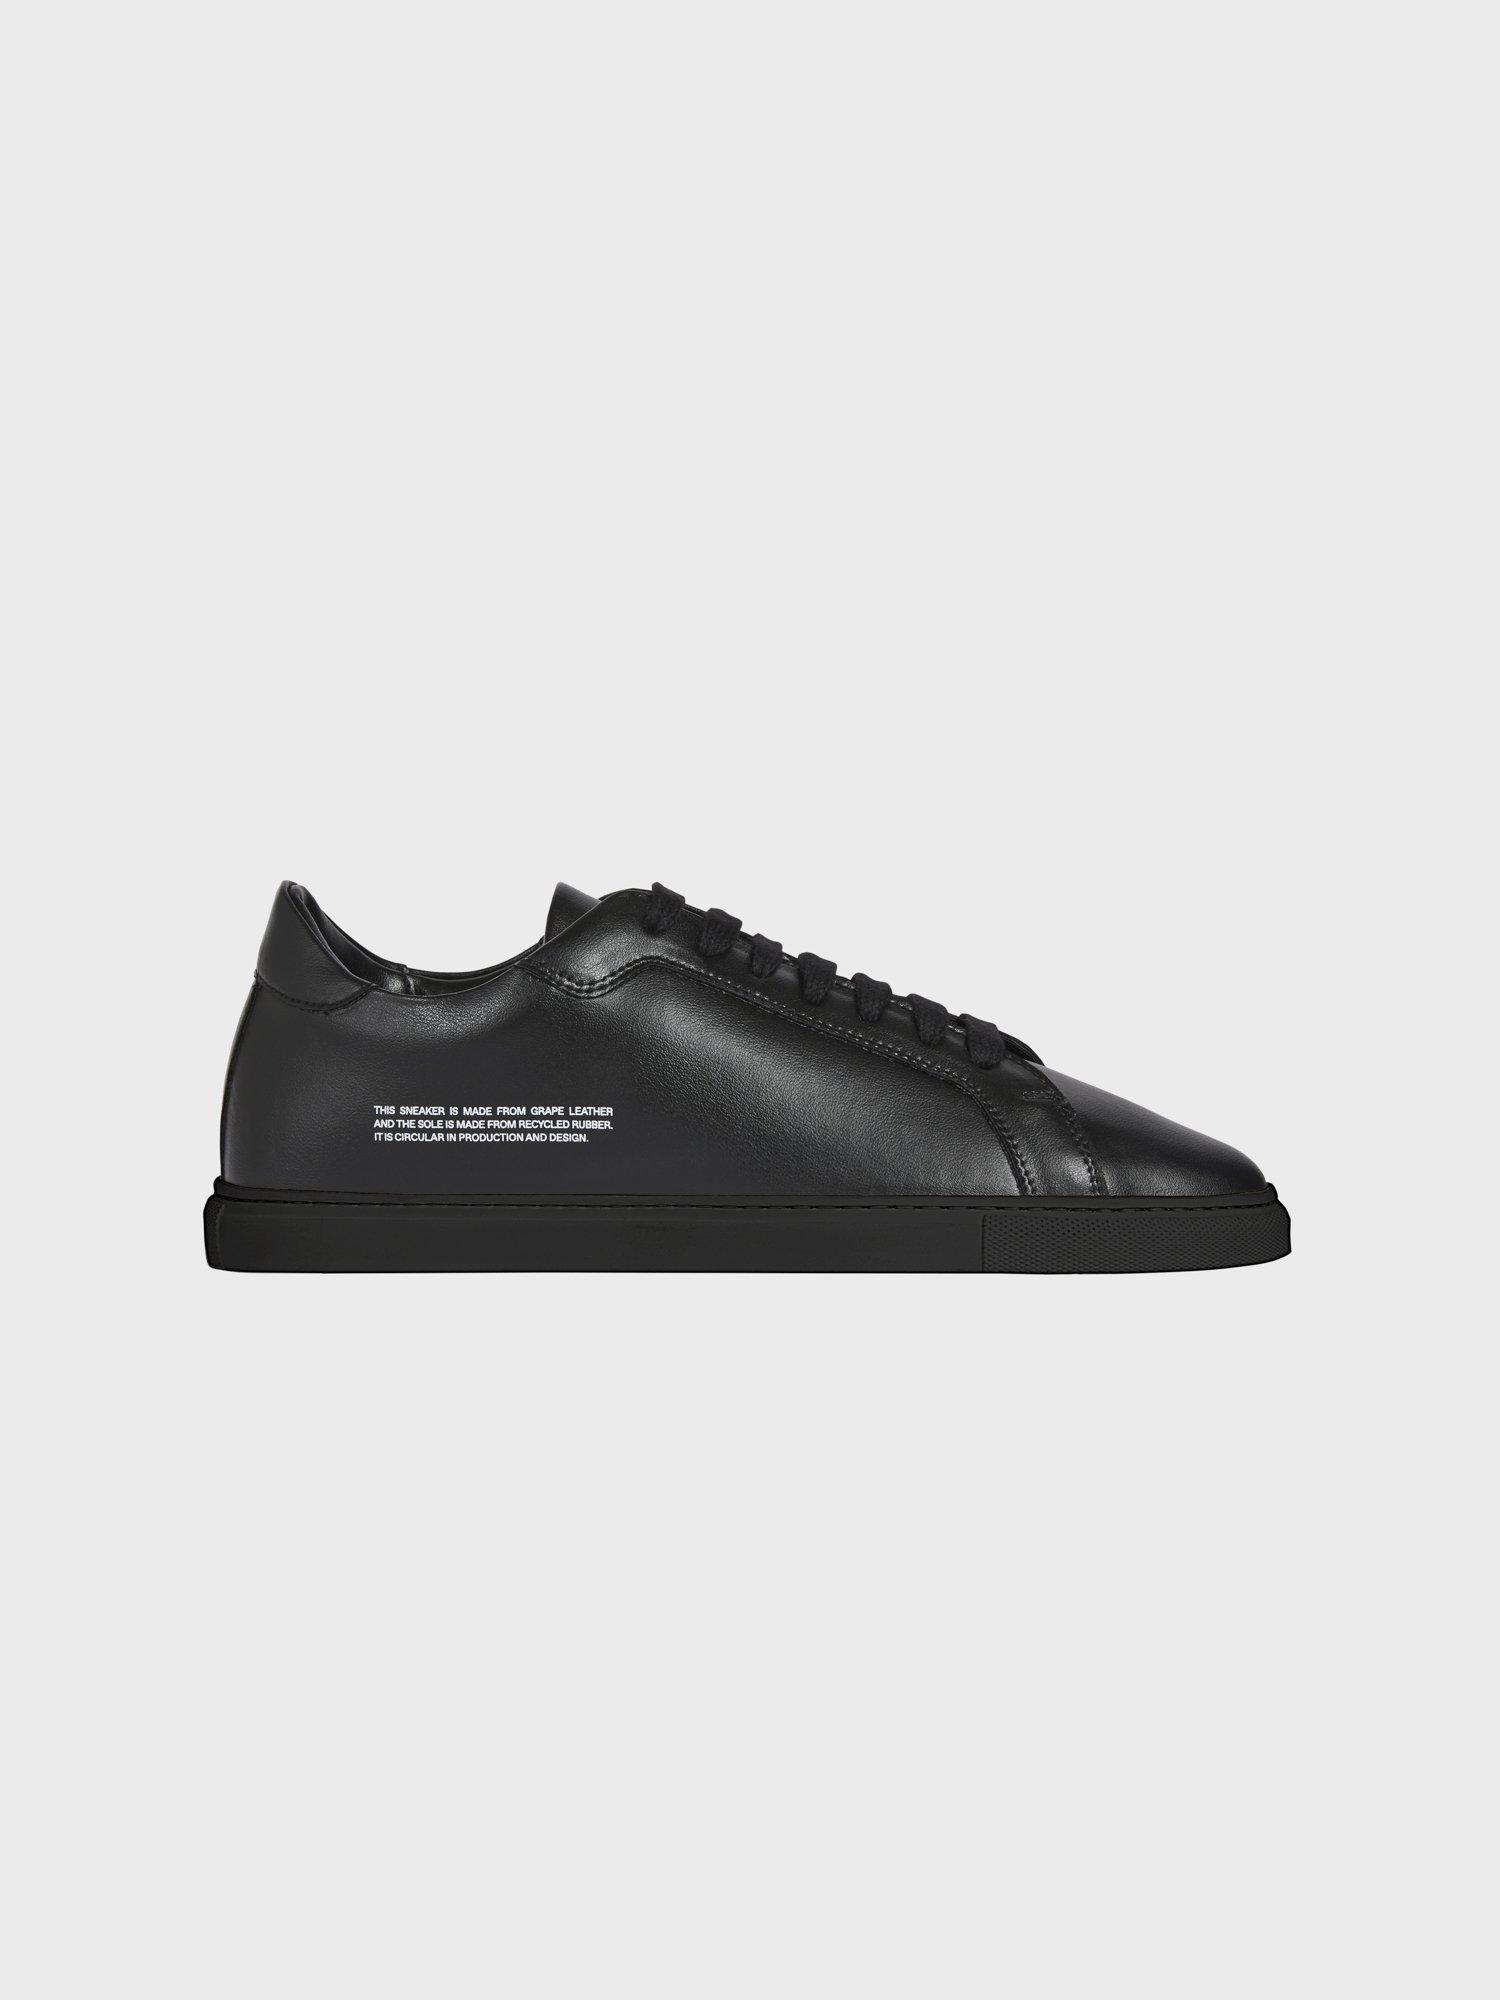 Women's grape leather sneakers